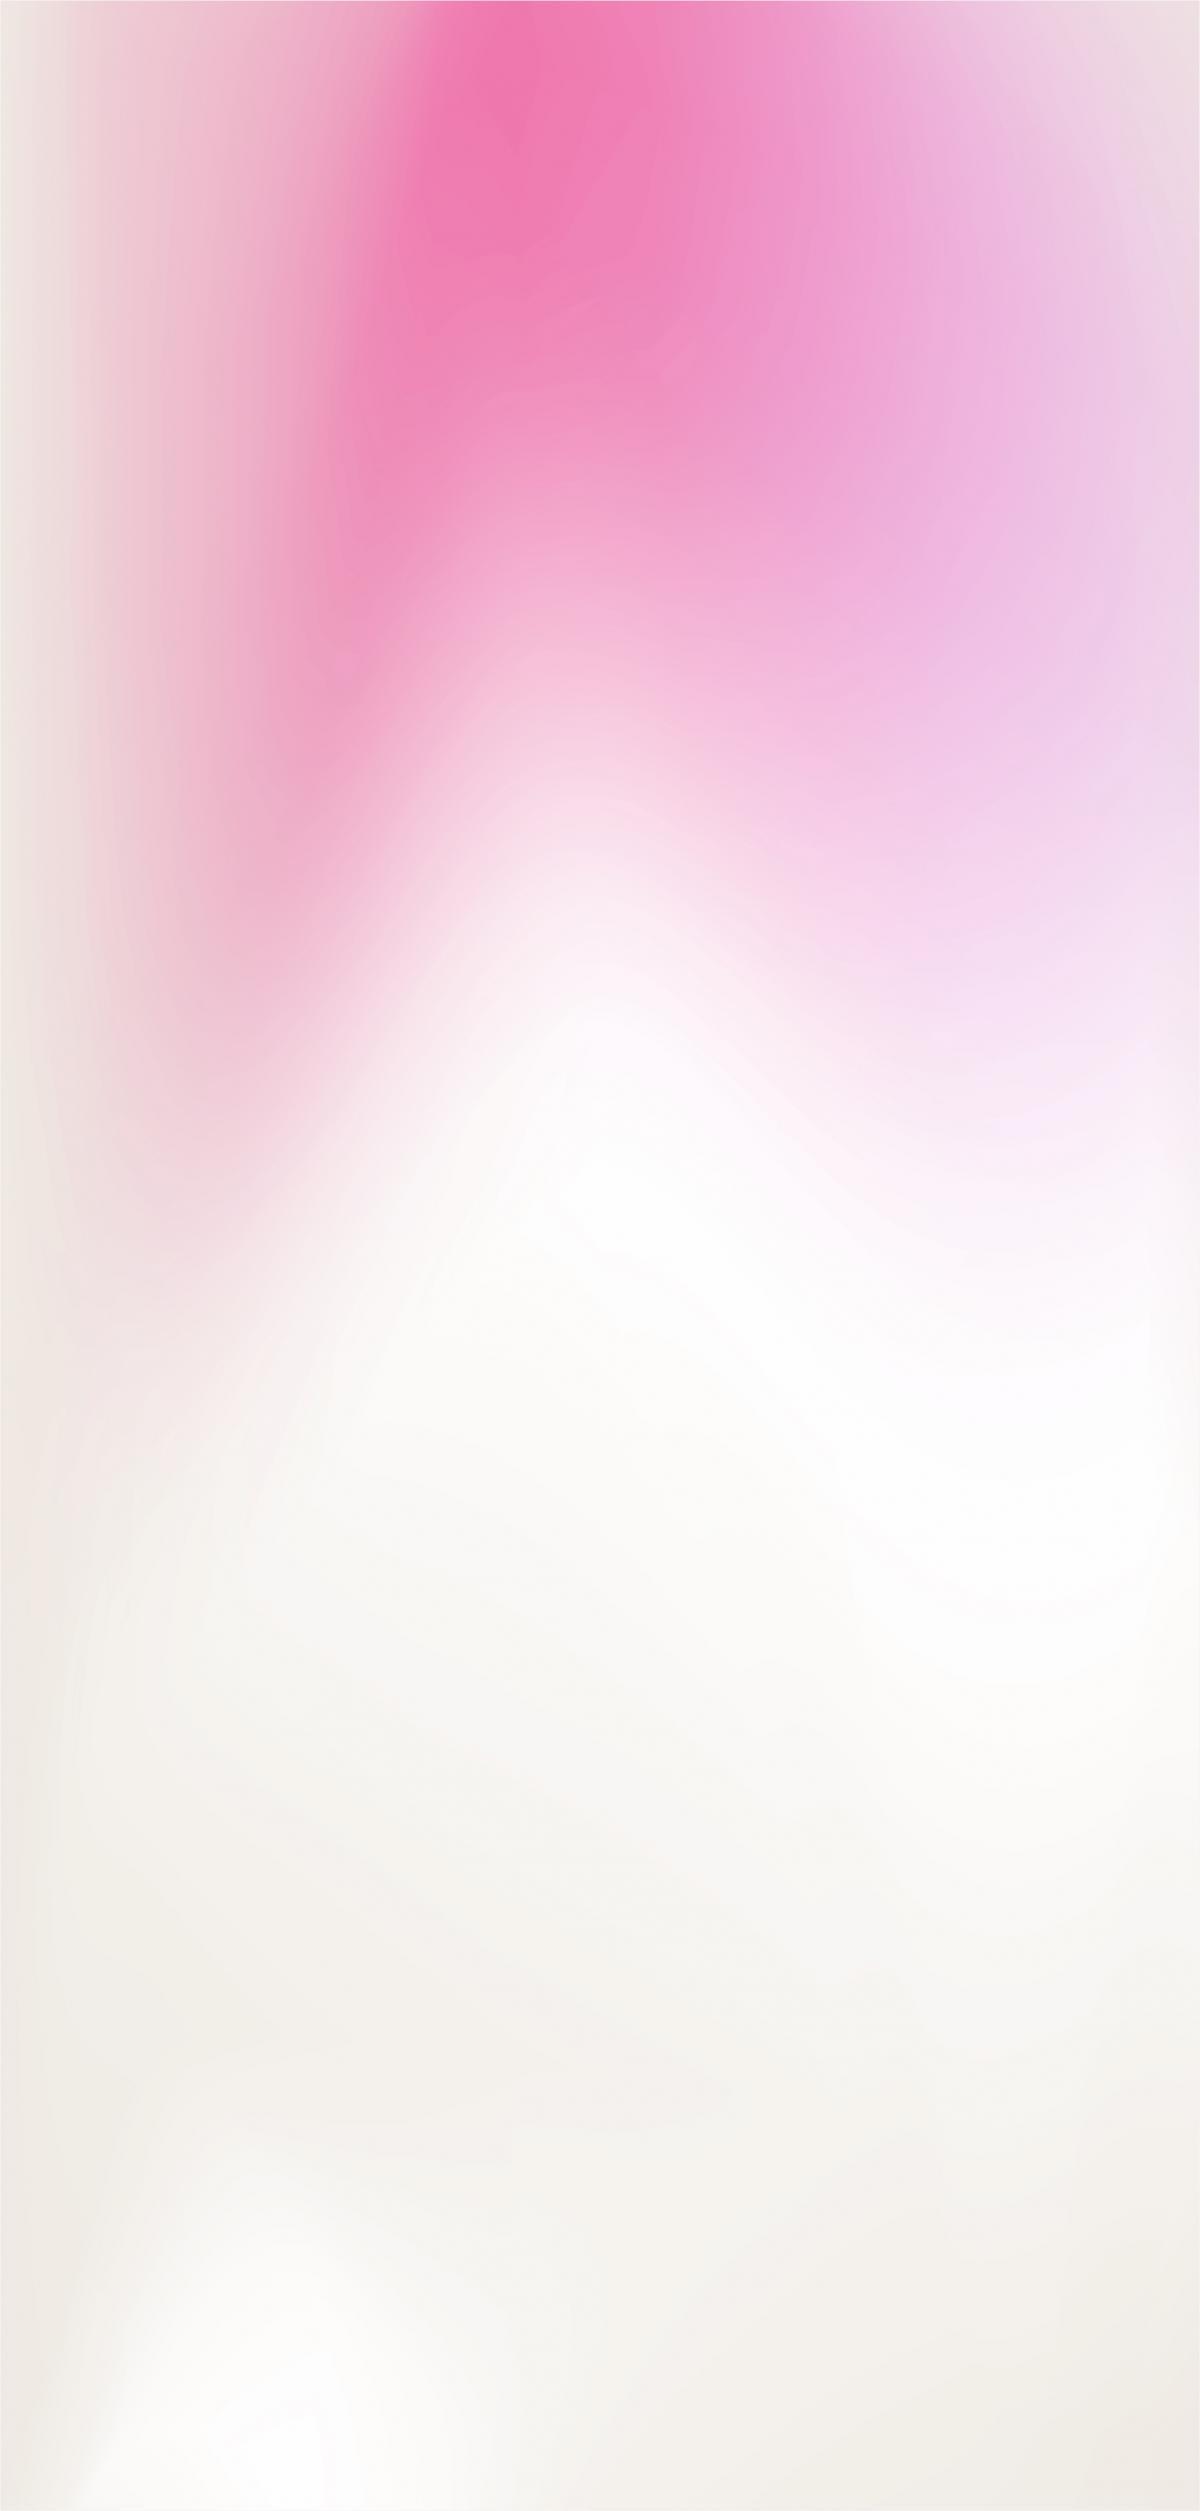 Pink to tan gradient